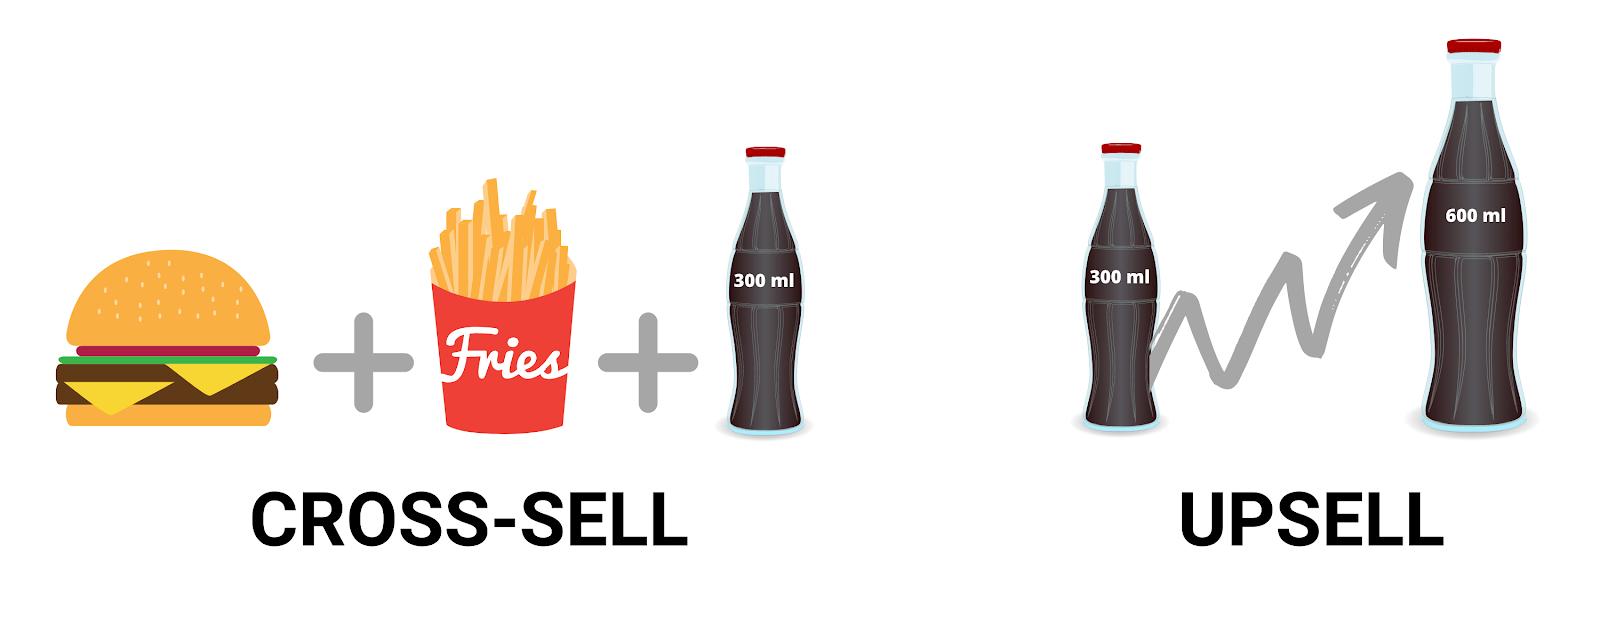 Cross-selling dan upselling sebagai cara memaksimalkan penjualan